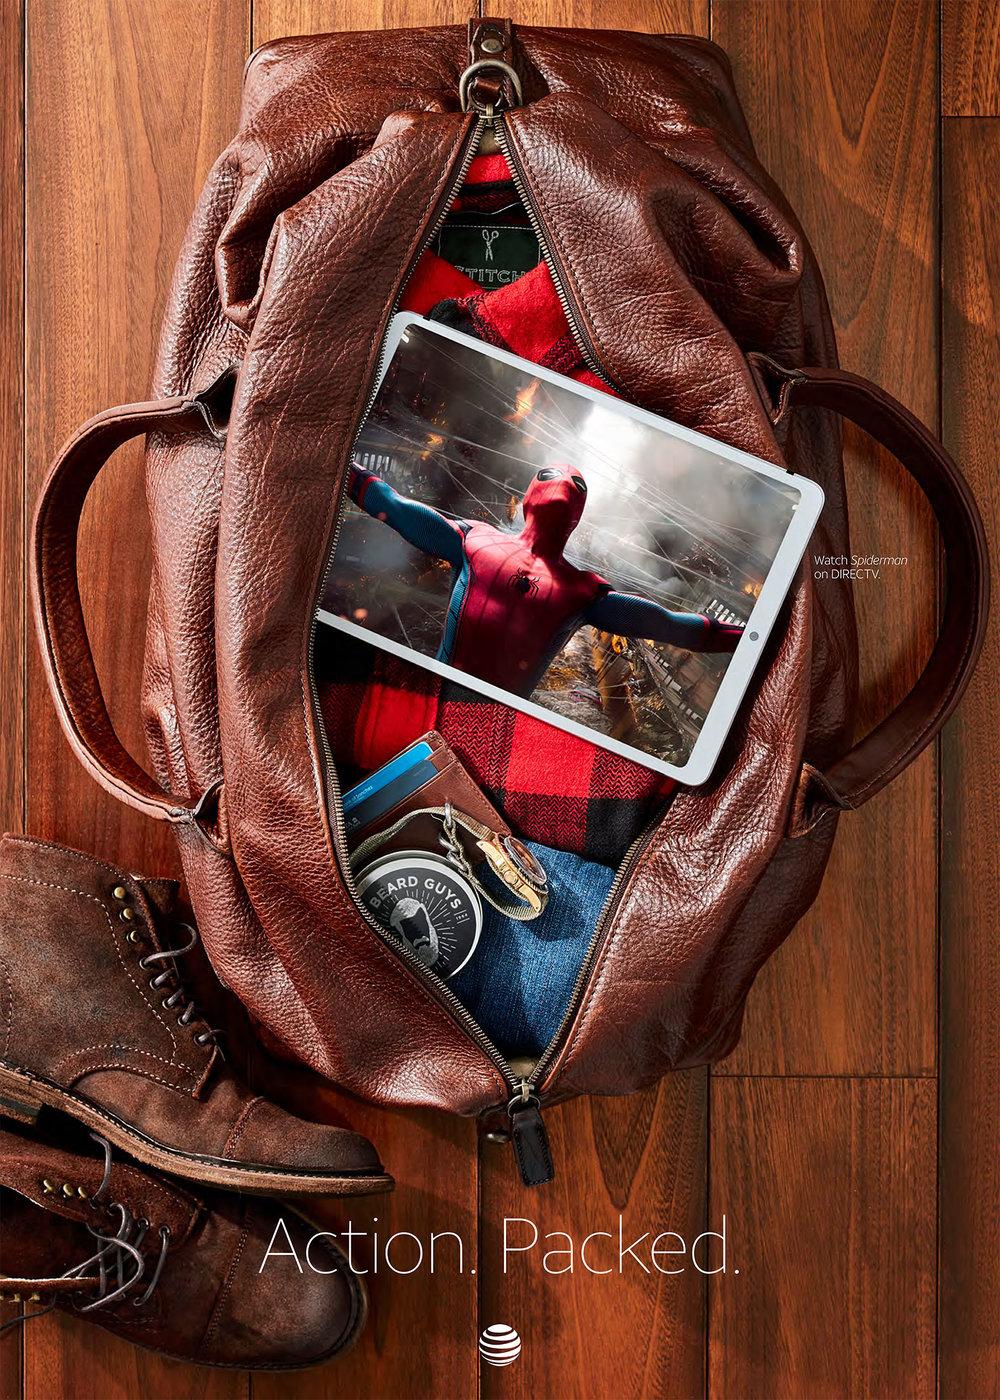 MKT1594_Lifestyle-Campaign_Comps-vert_SA_C2-1.jpg